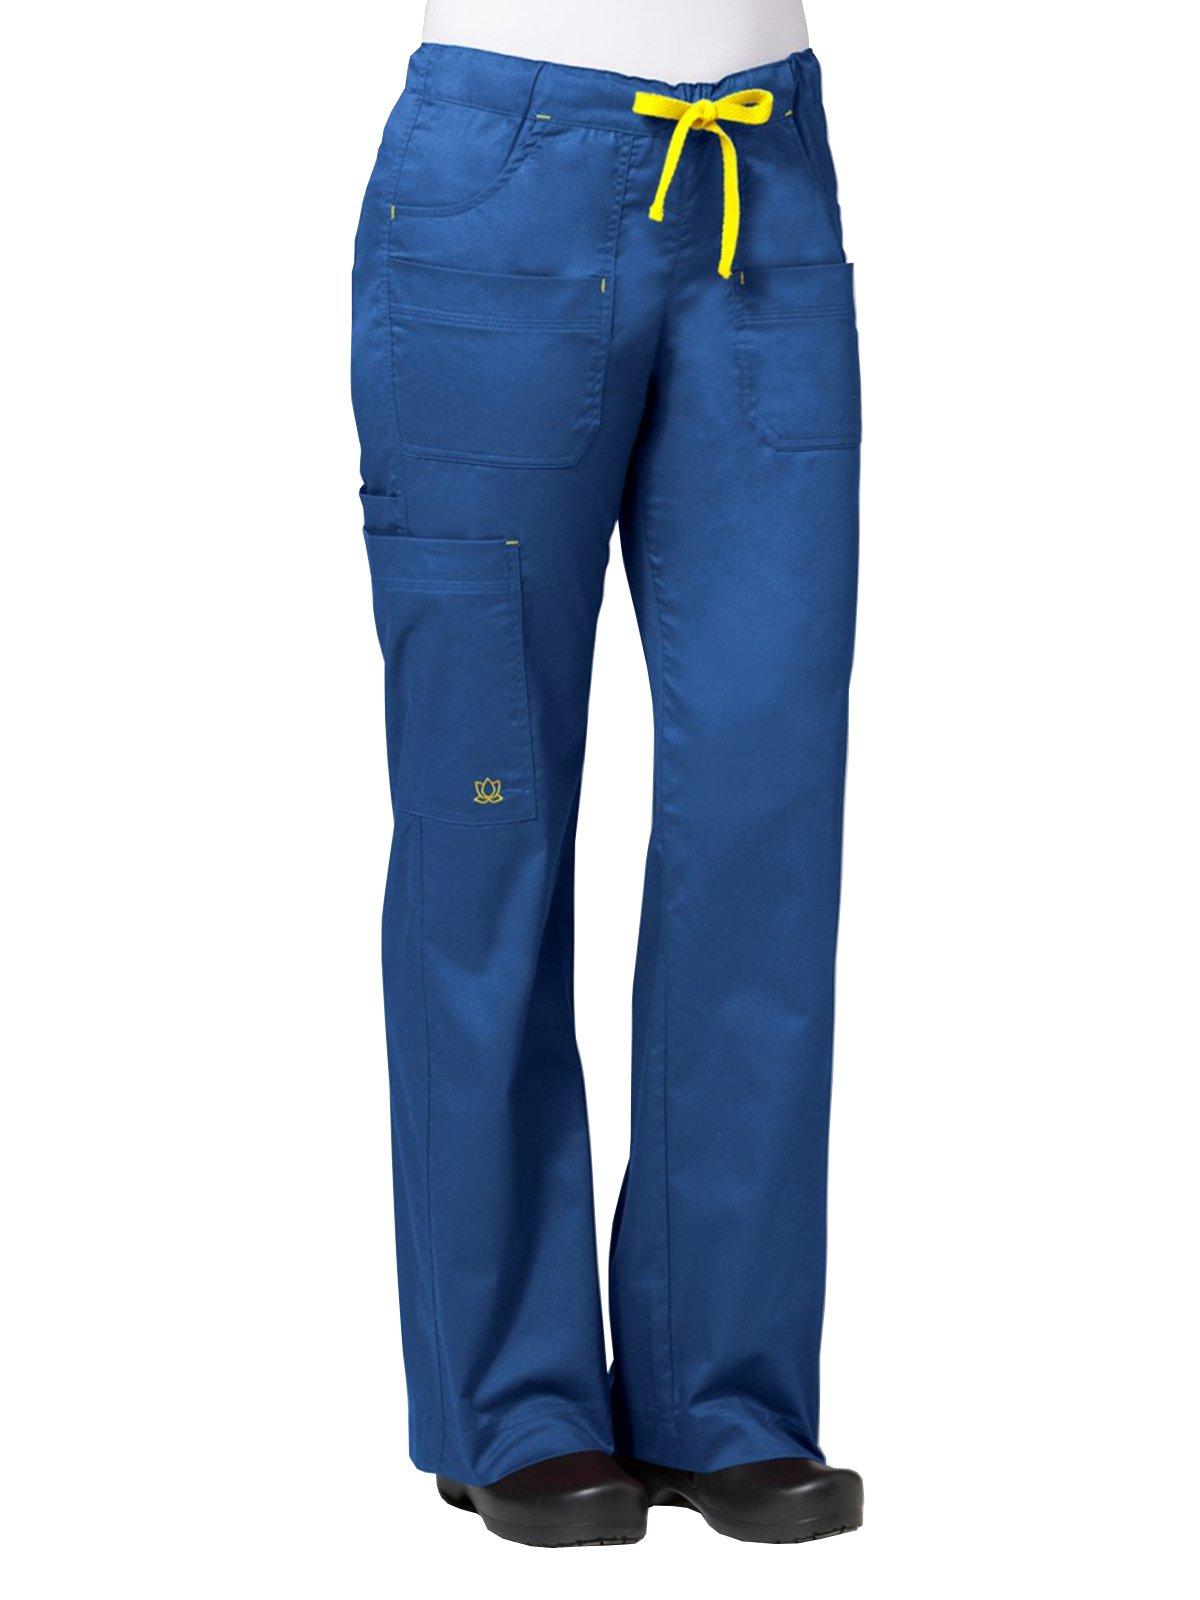 Maevn Blossom Women's Utility Cargo Pants (XXX-Large Tall, Royal Blue)